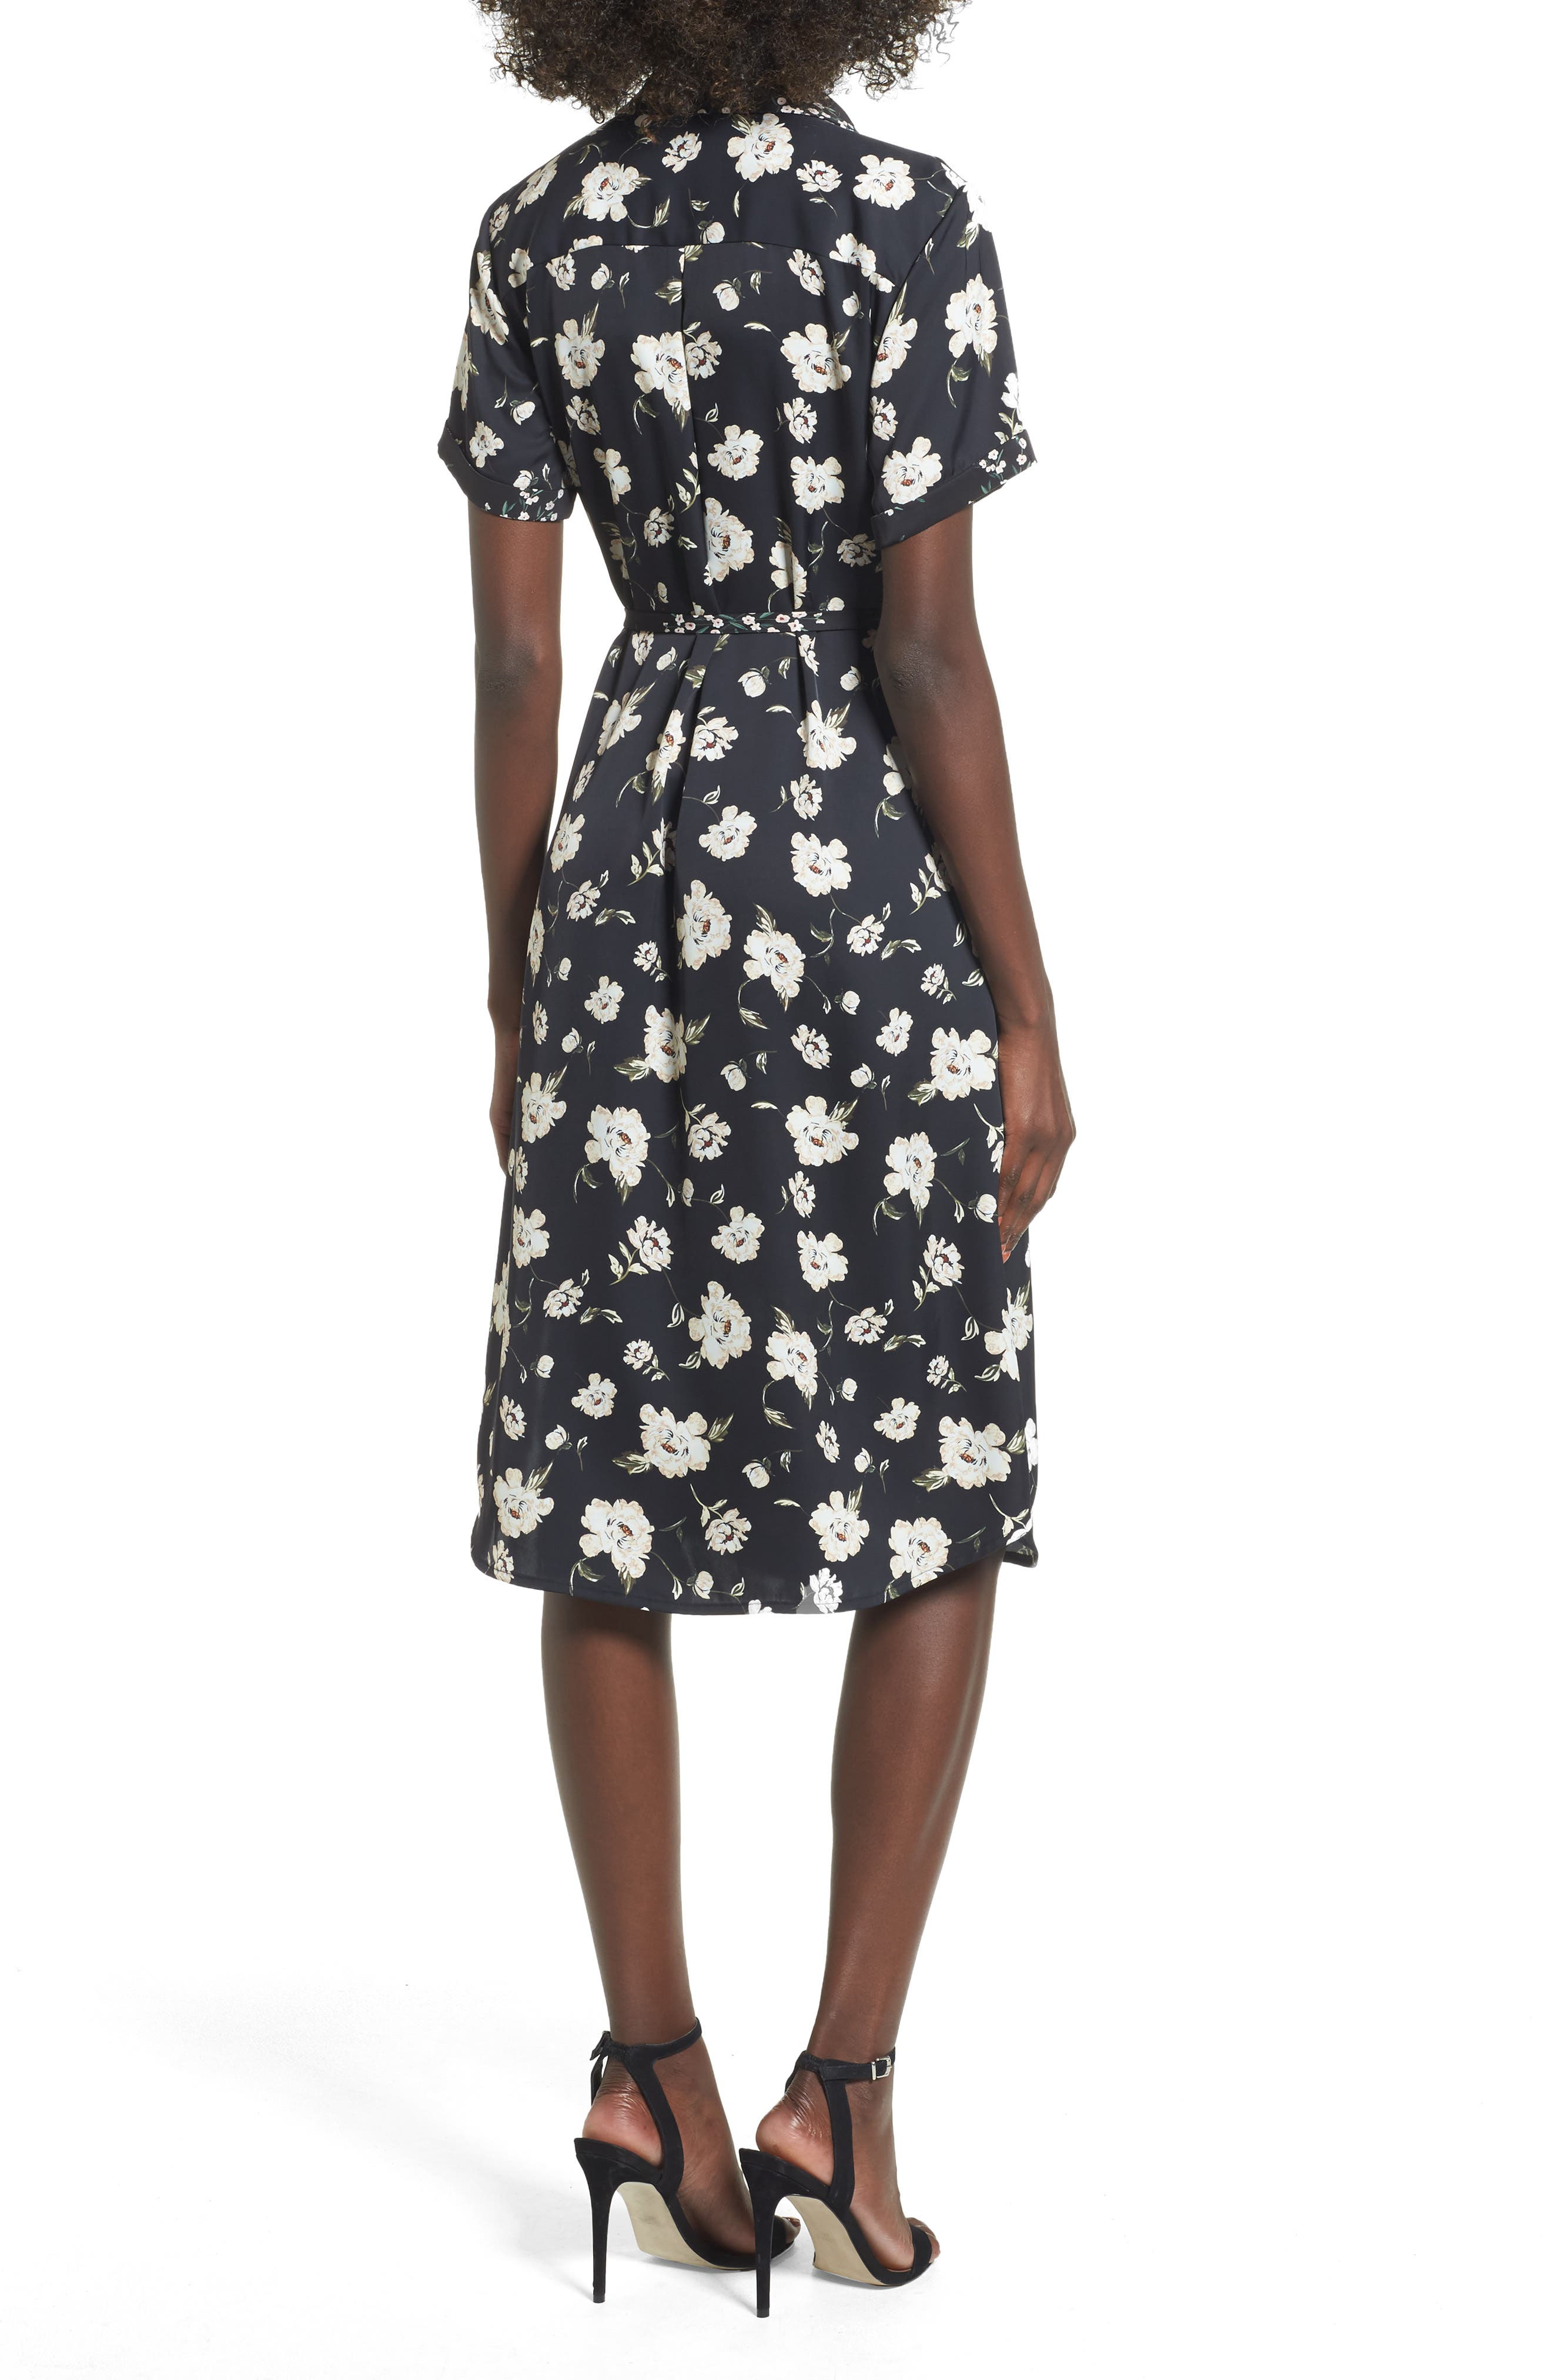 L'Academie The Shirt Dress Midi Dress,                             Alternate thumbnail 2, color,                             001